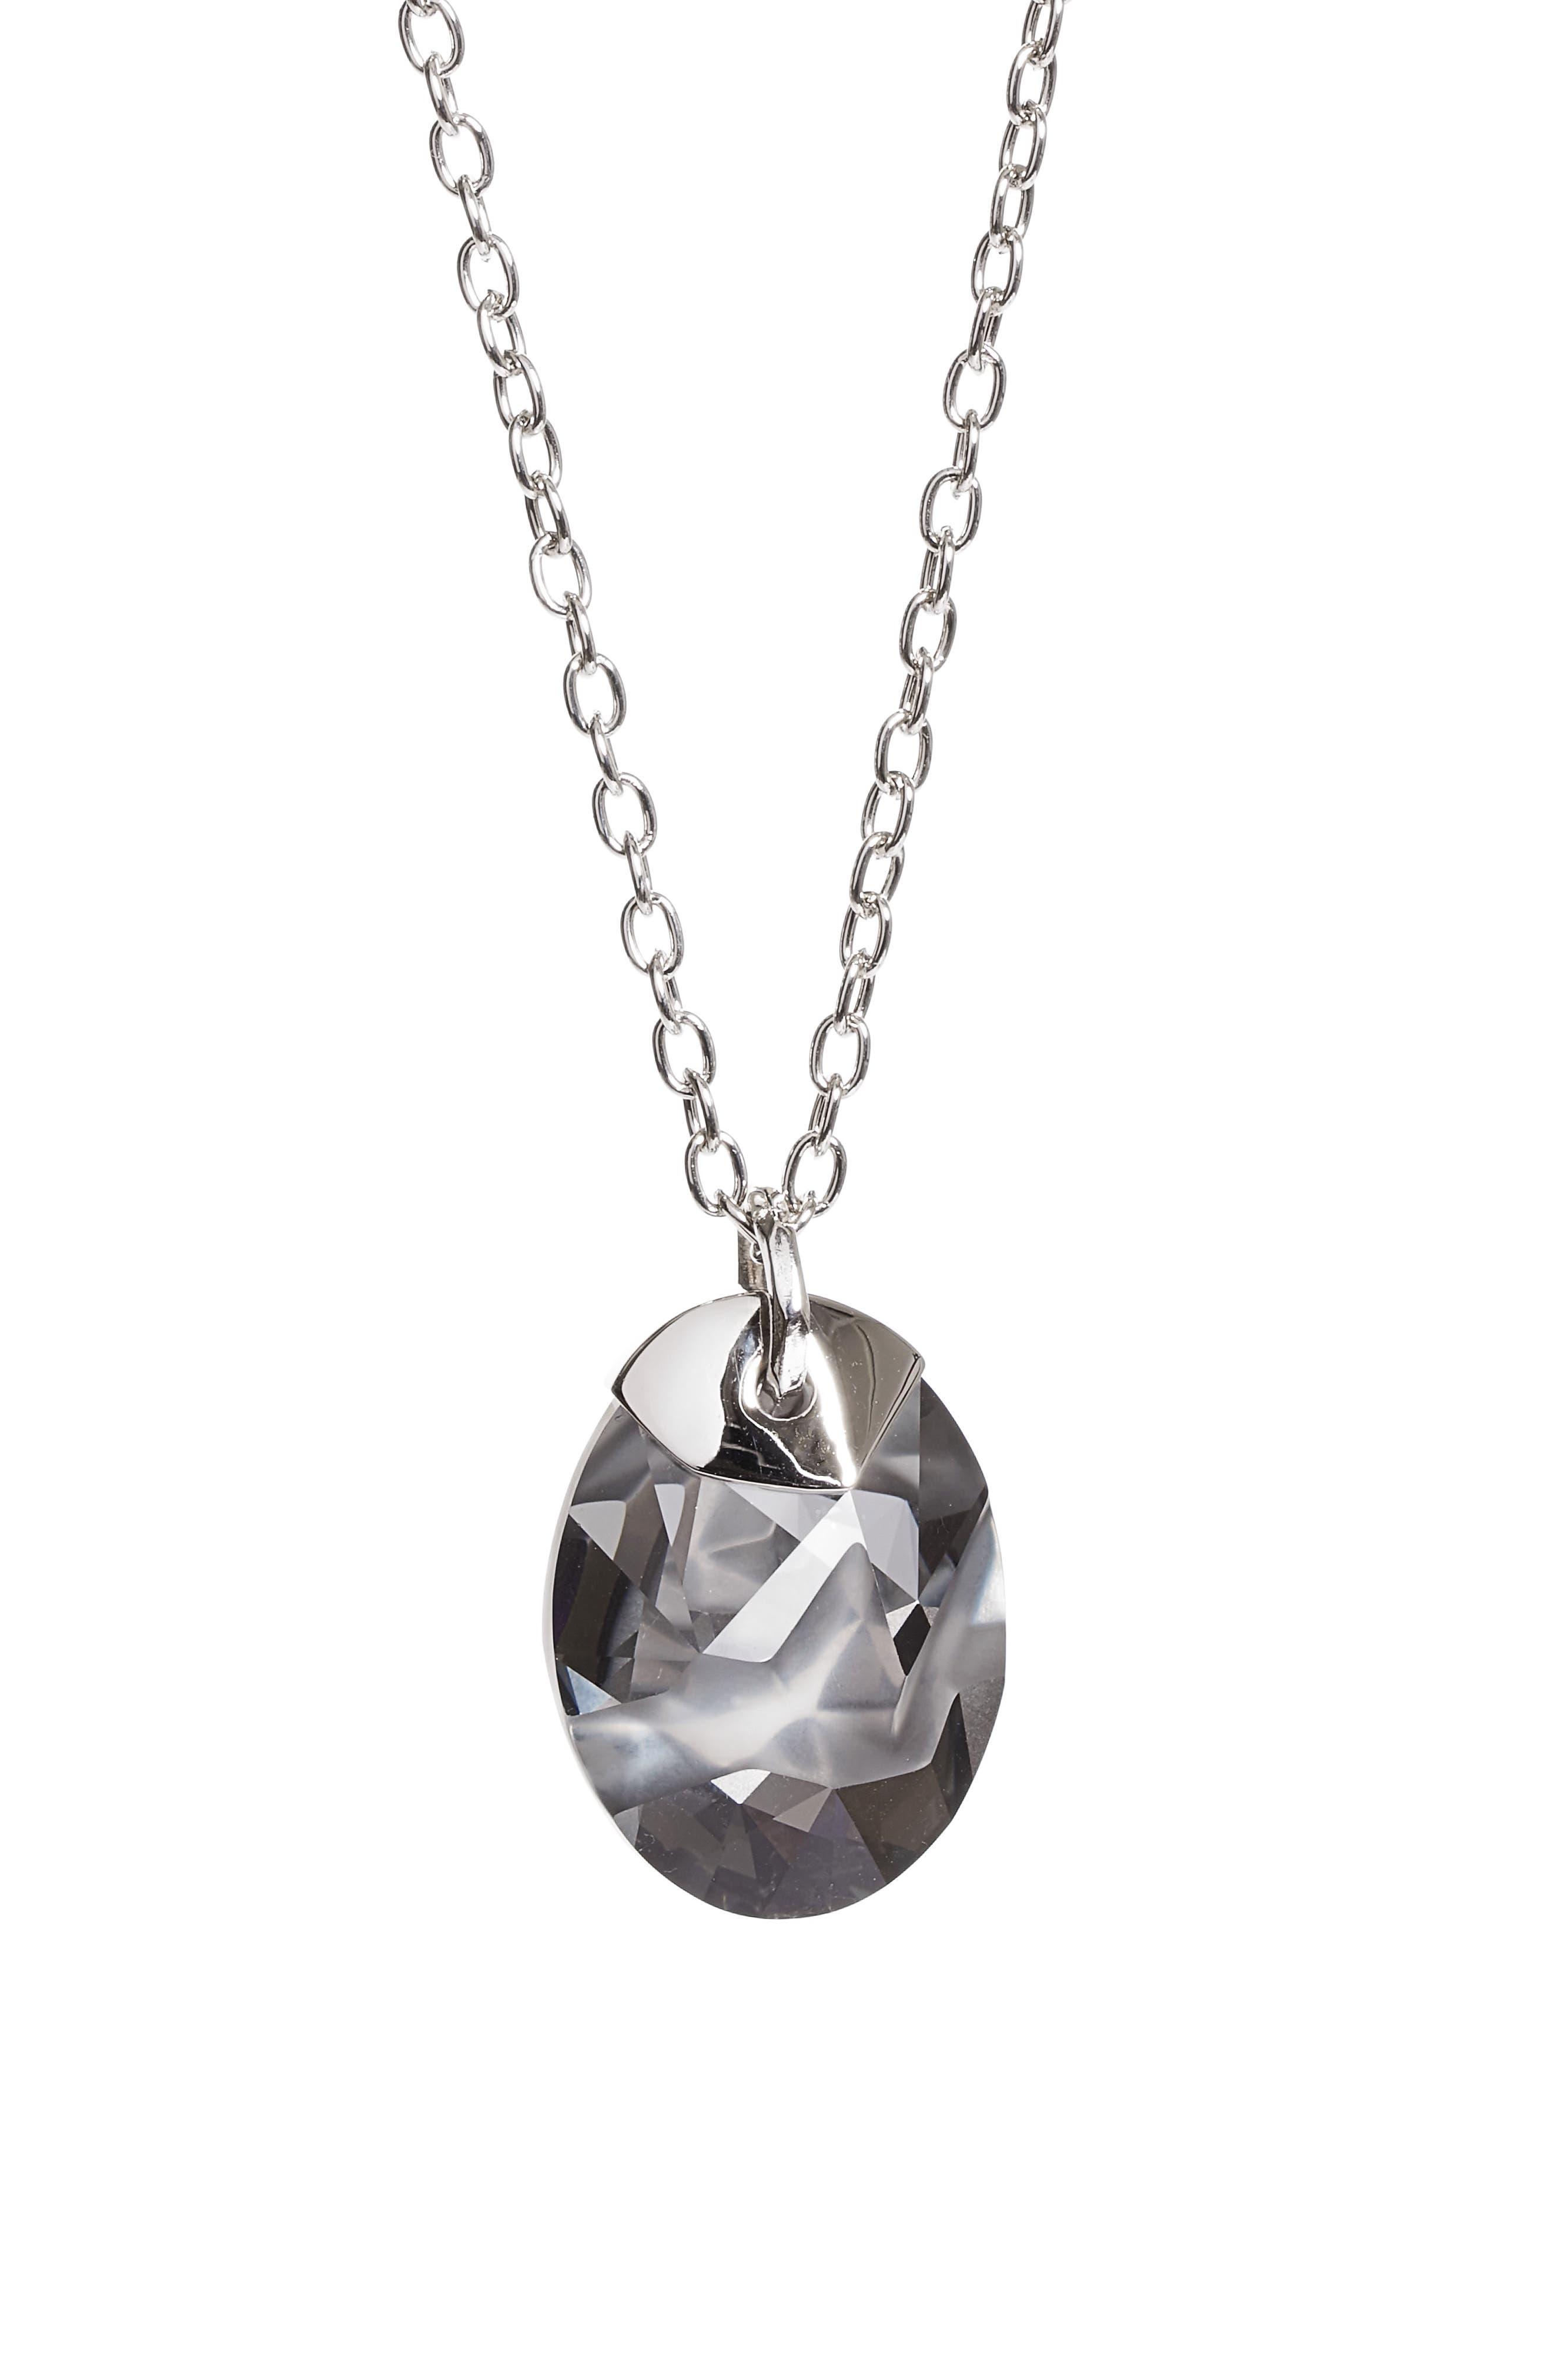 Swarovski Crystal Pendant Necklace,                             Main thumbnail 1, color,                             020